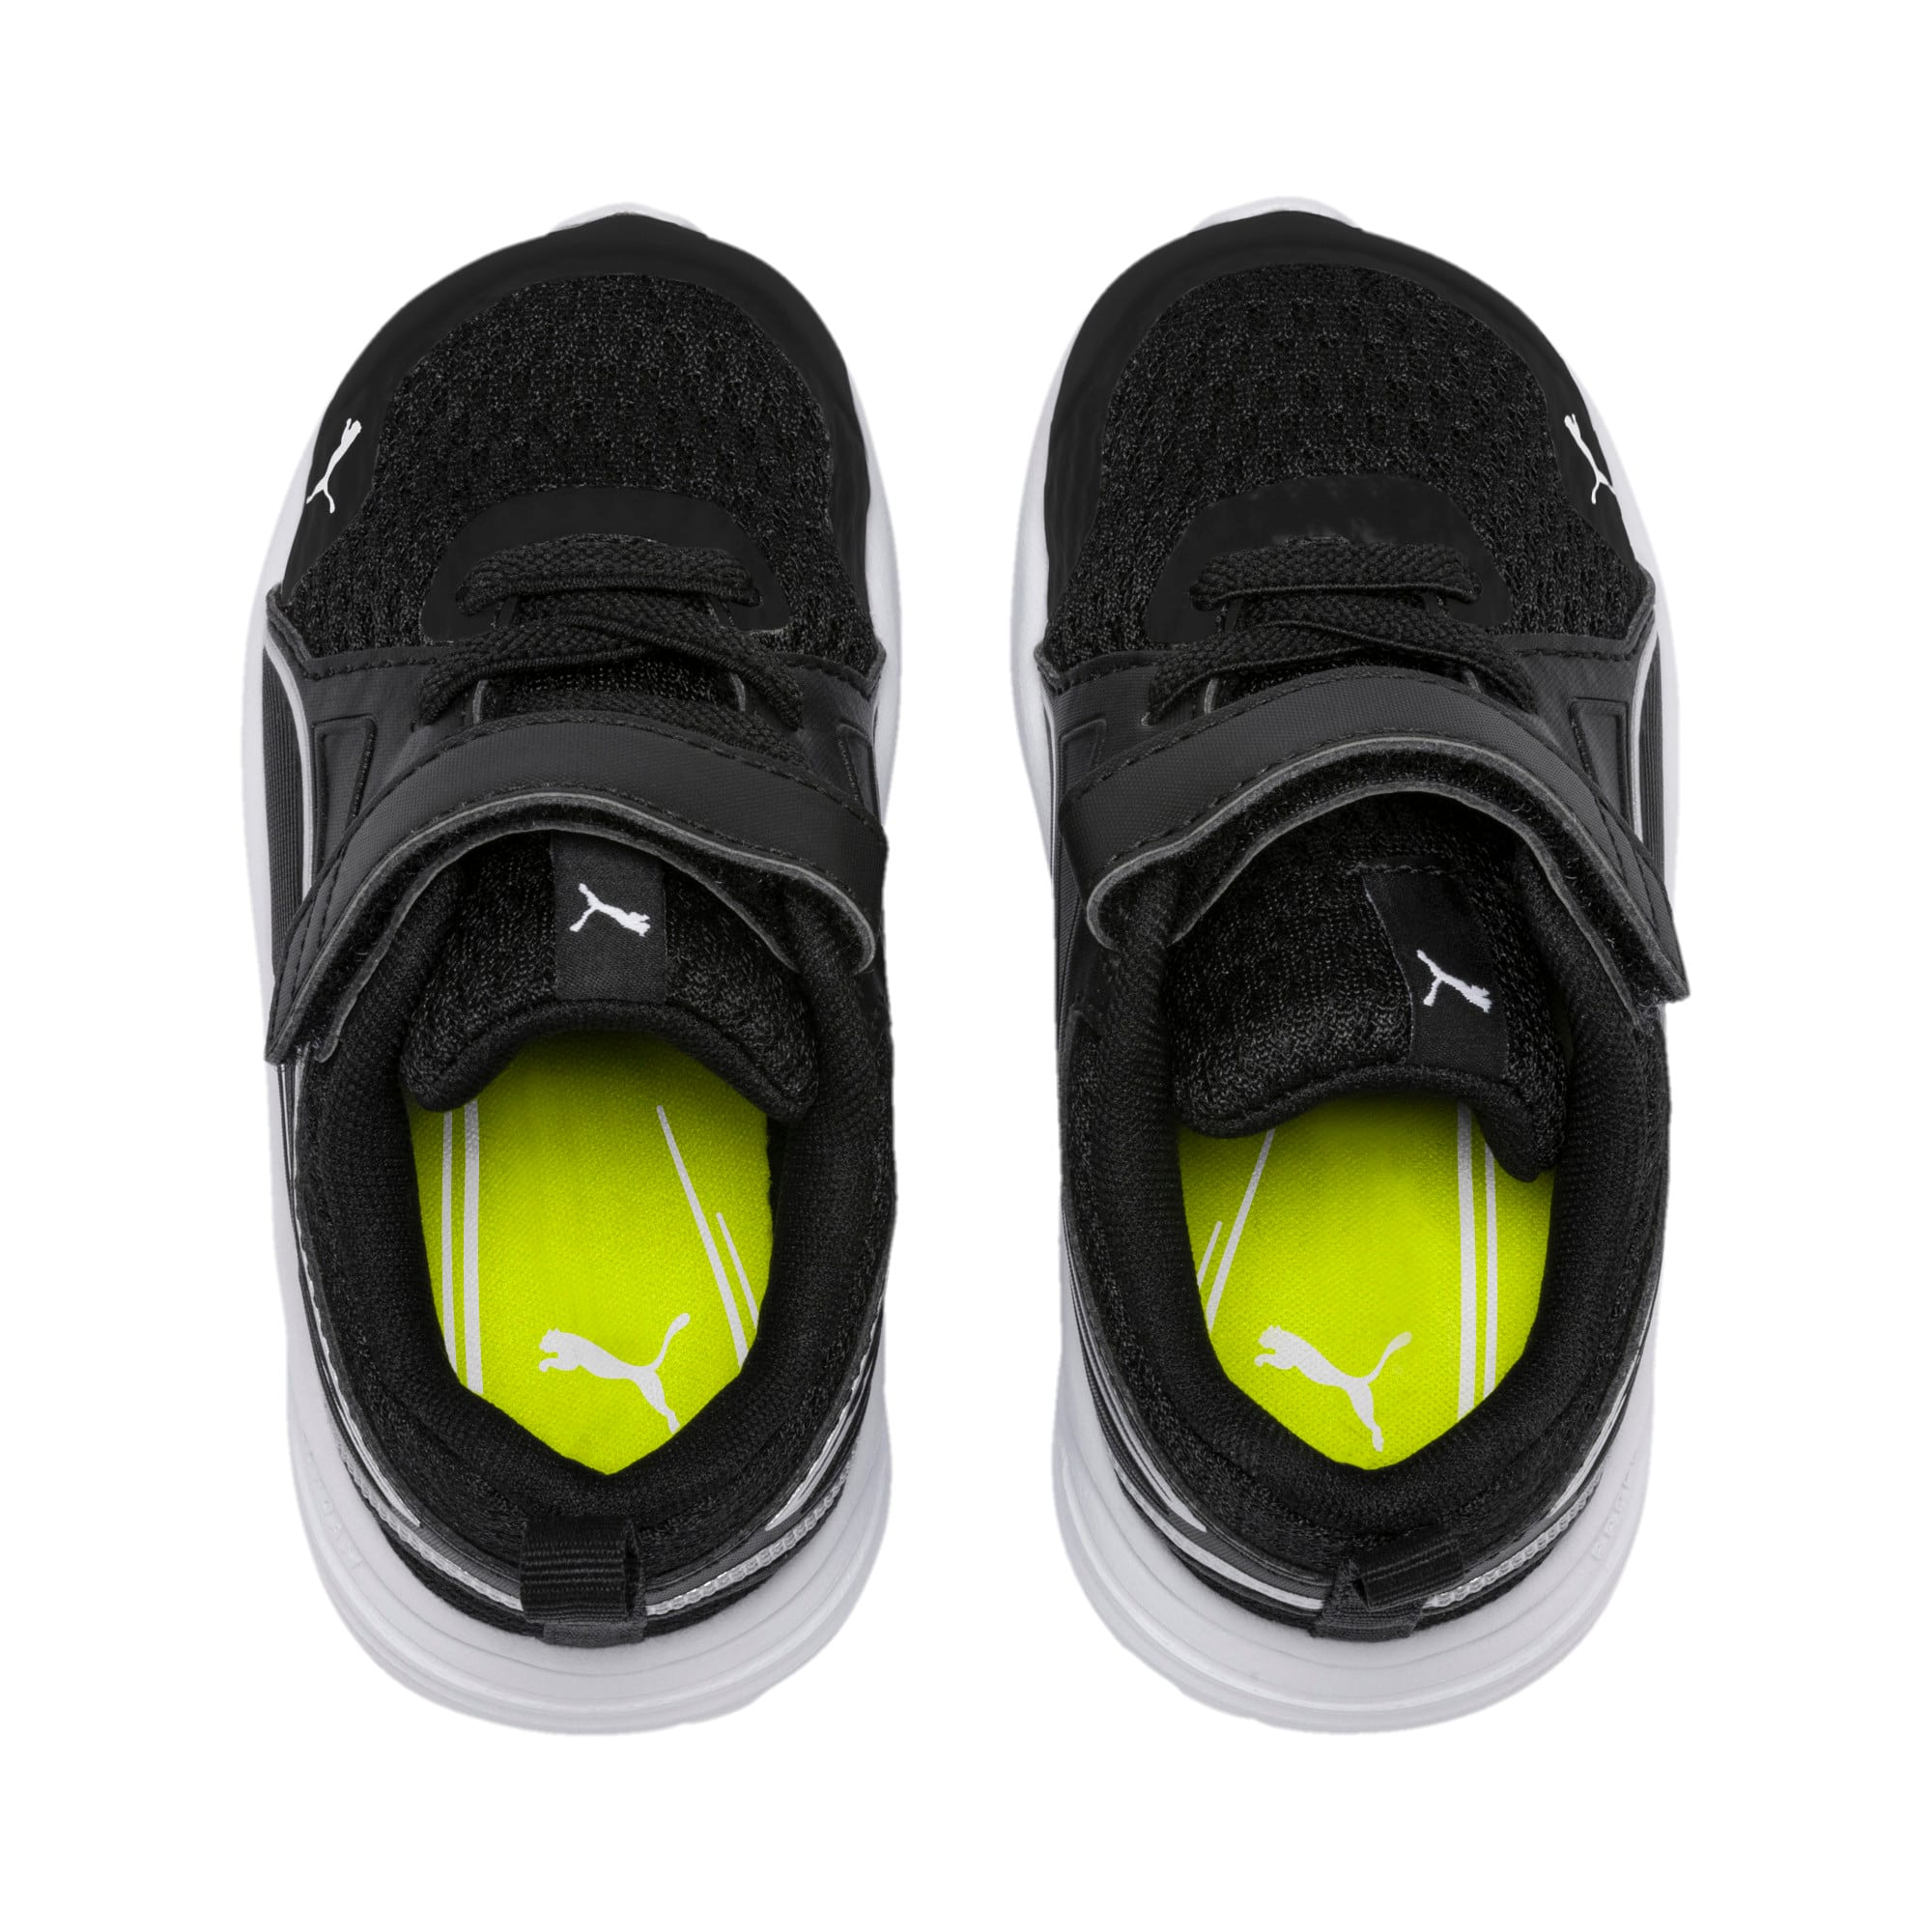 Thumbnail 6 of Pure Jogger Babies Sneaker, Black-Silver-Wht-Nrgy Yellow, medium